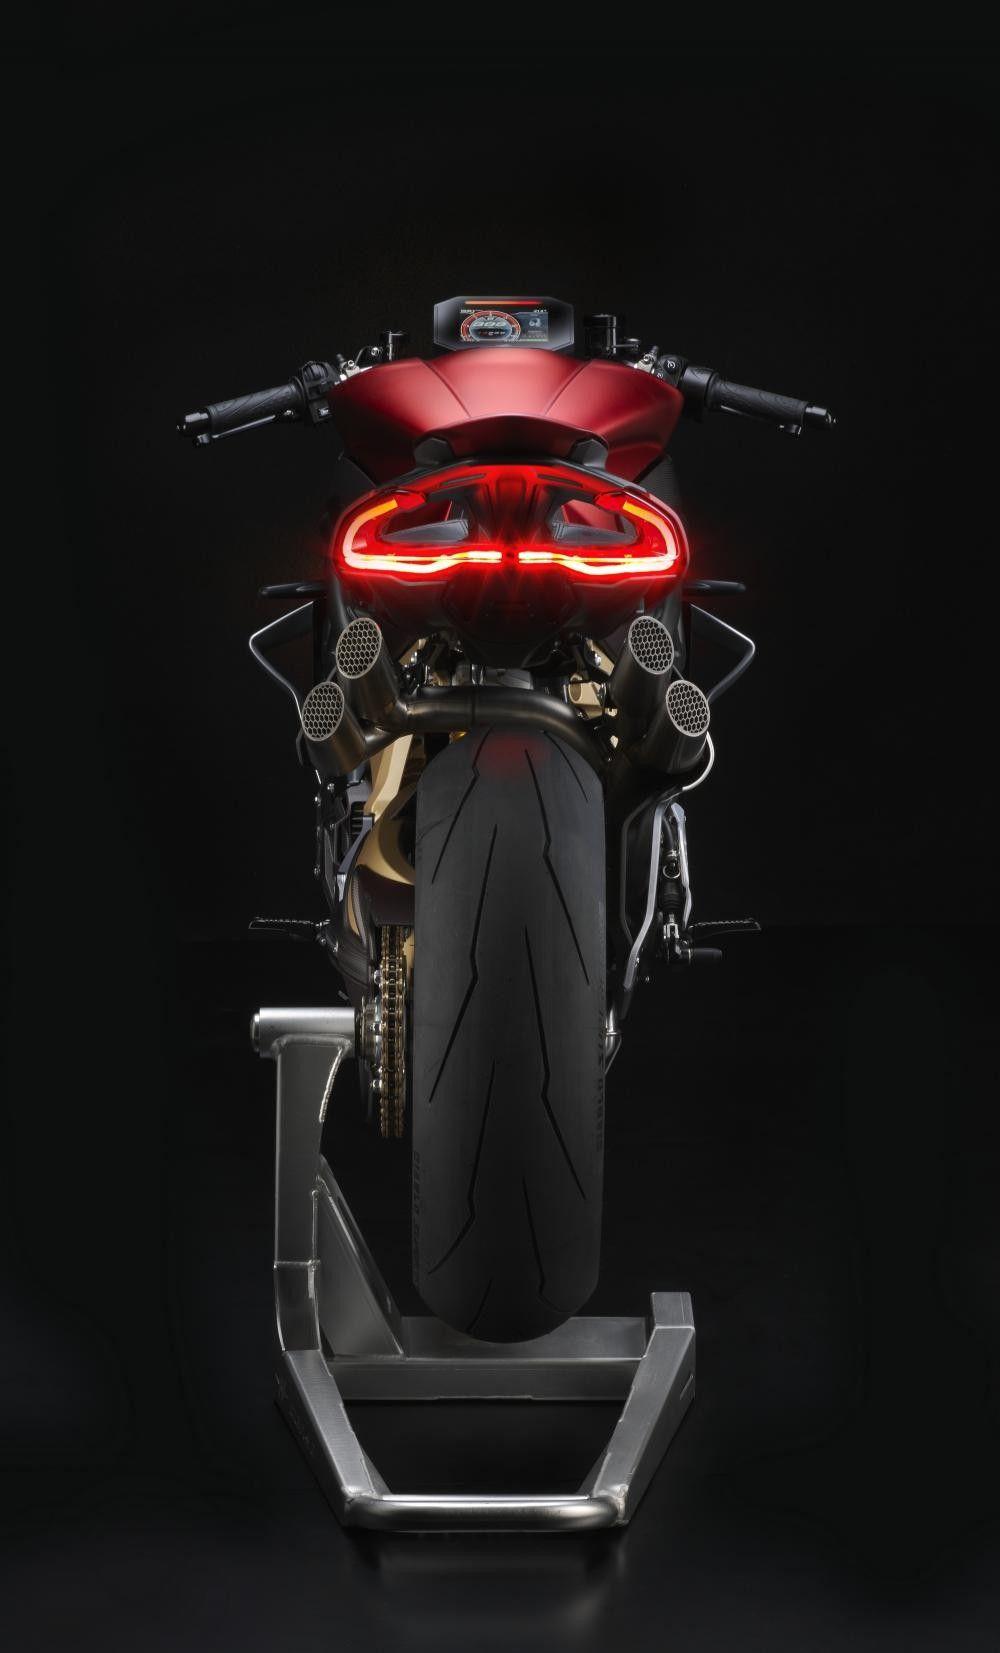 Mv Agusta Brutale 1000 Serie Oro Mv Agusta Brutale Mv Agusta Sports Bikes Motorcycles Mv agusta brutale 1000 serie oro